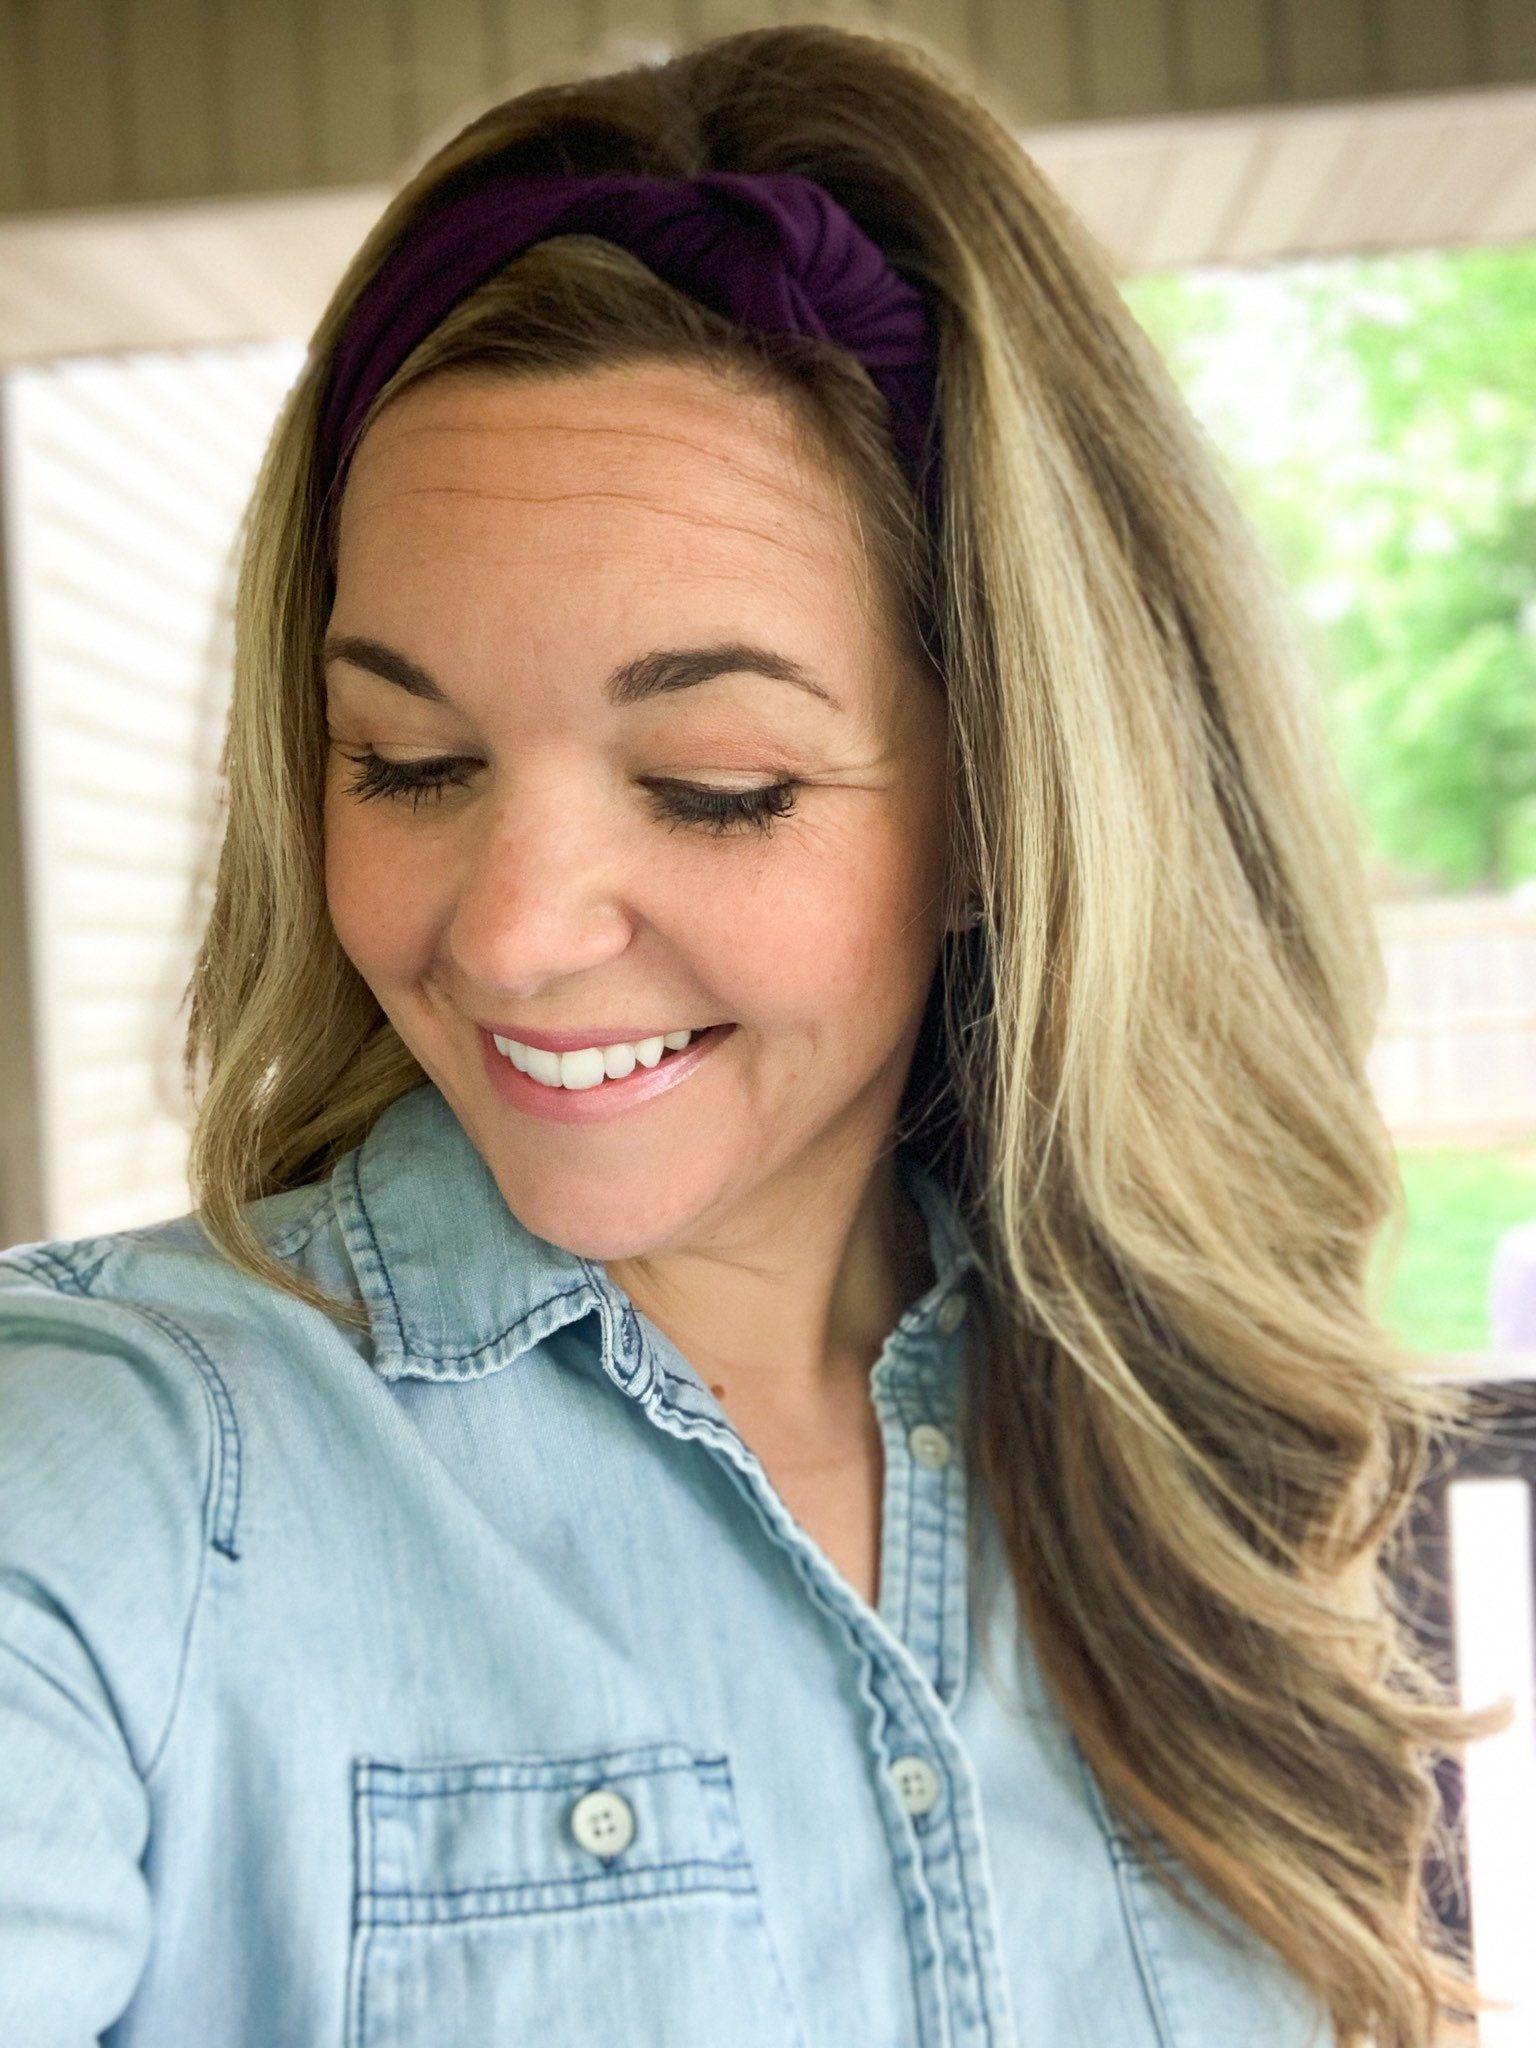 Purple Knot Headband - Wide Headband - Womens Headband - Yoga Headband- Headbands for Women - Nurse Headband - Boho